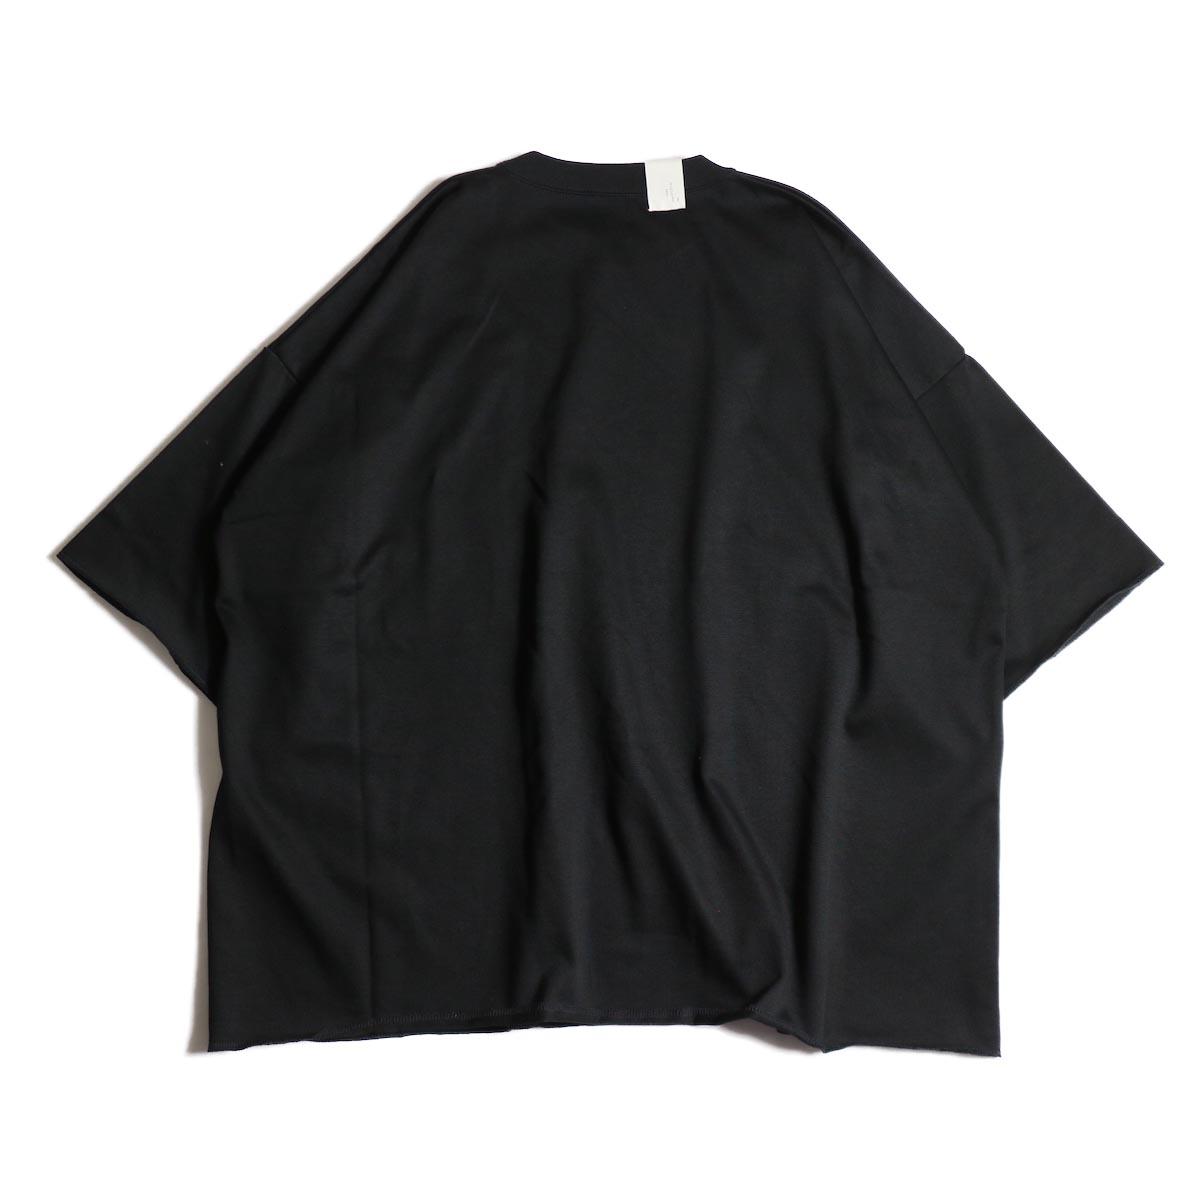 N.HOOLYWOOD / 1202-CS13-034 Big Tee (Black)背面